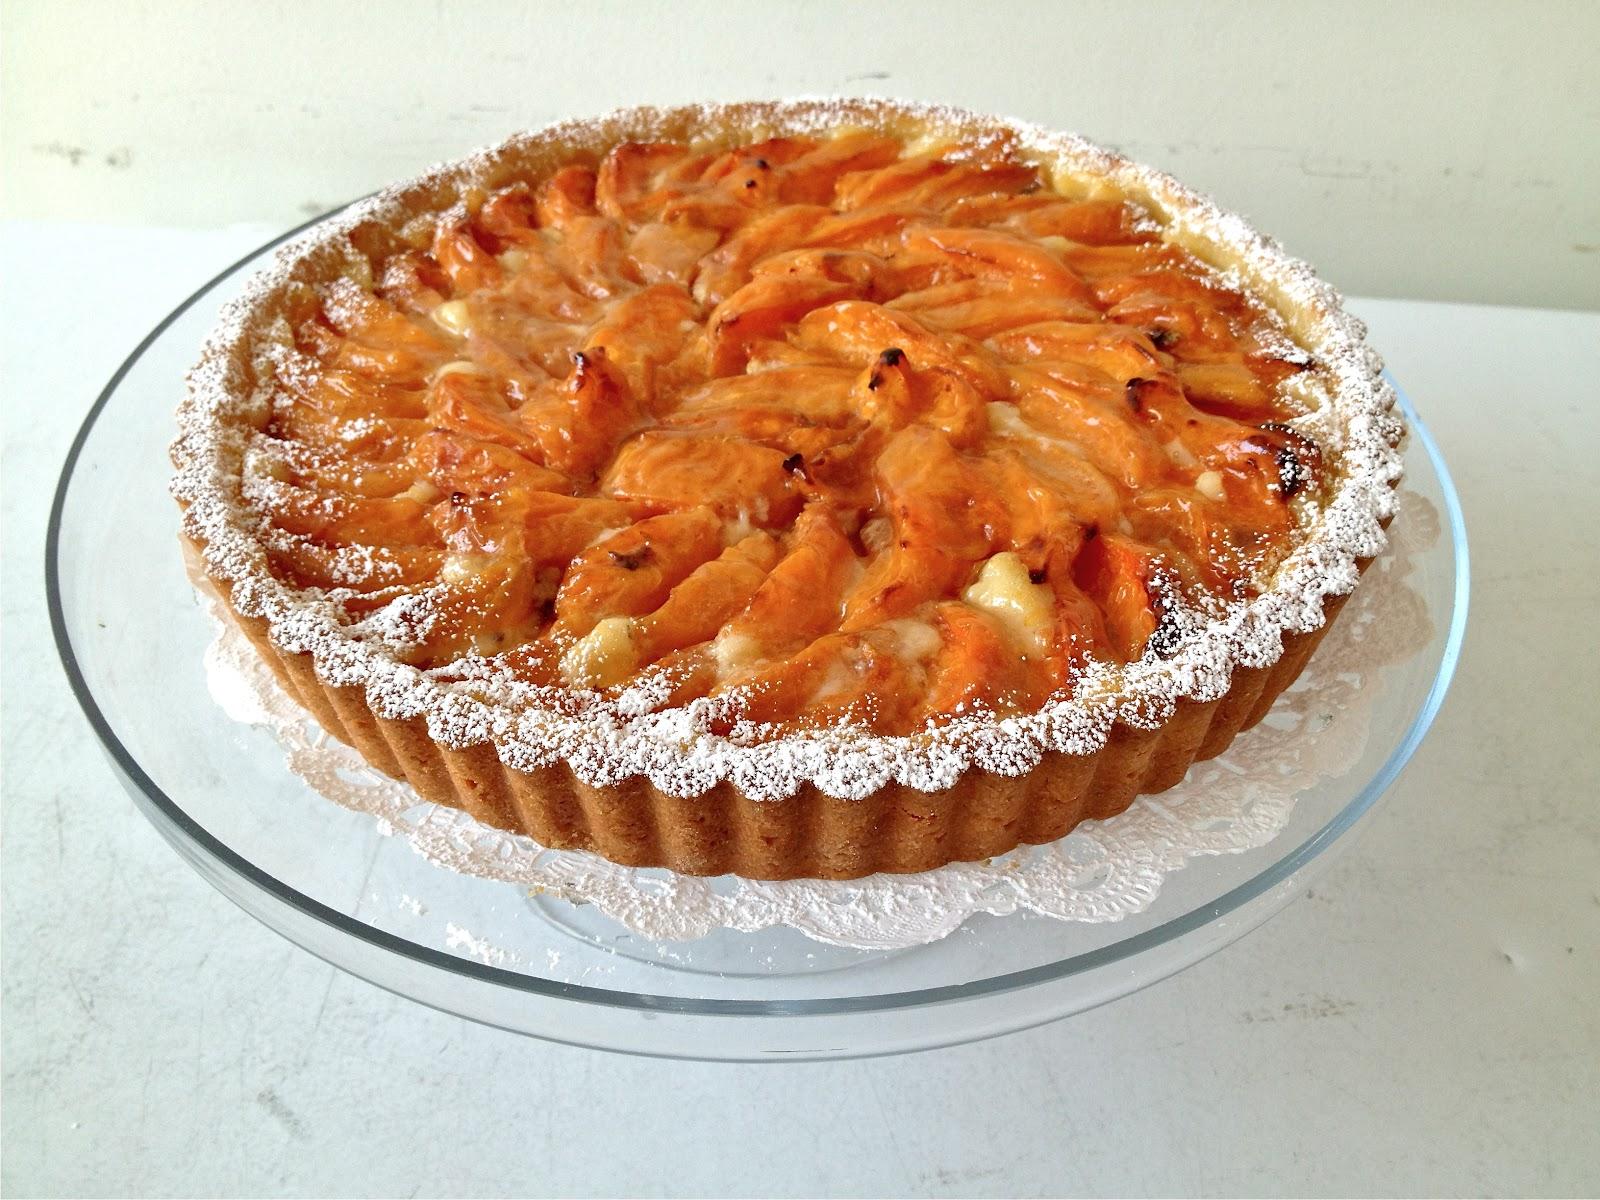 ... Sugar Hippie: Tarte Amandine aux Abricots (Apricot Almond Cream Tart